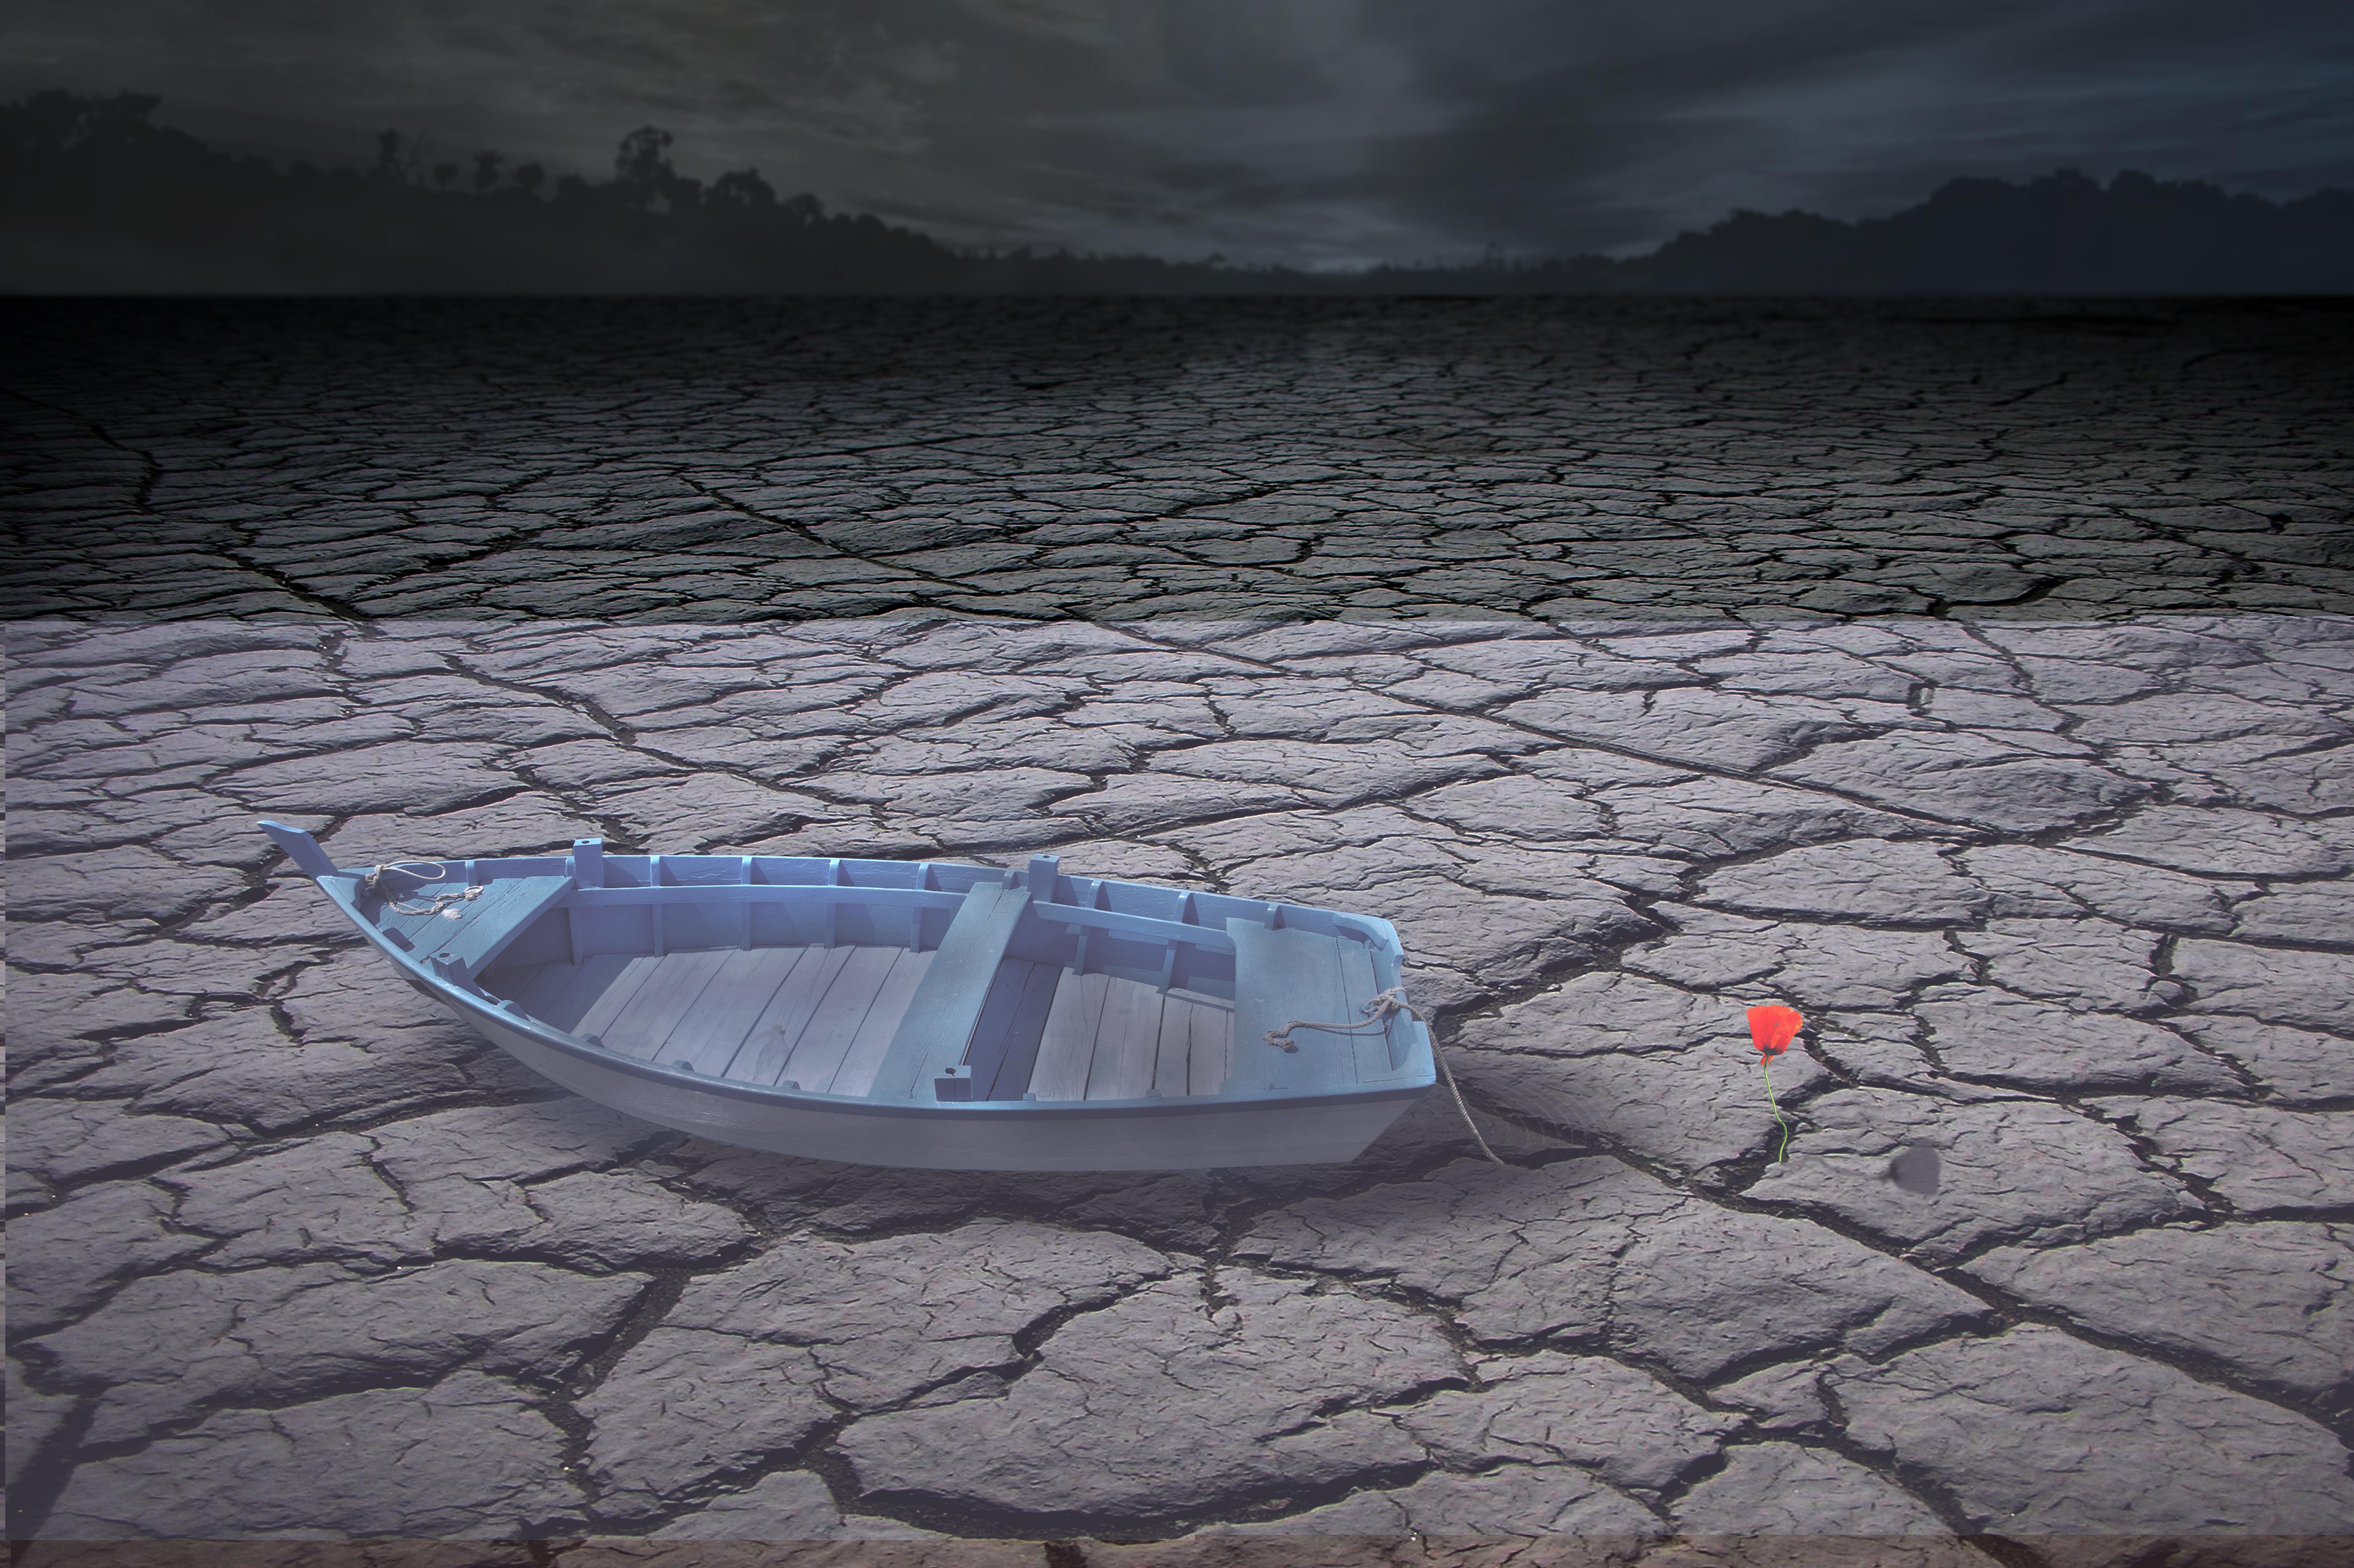 Boat on barren land photo